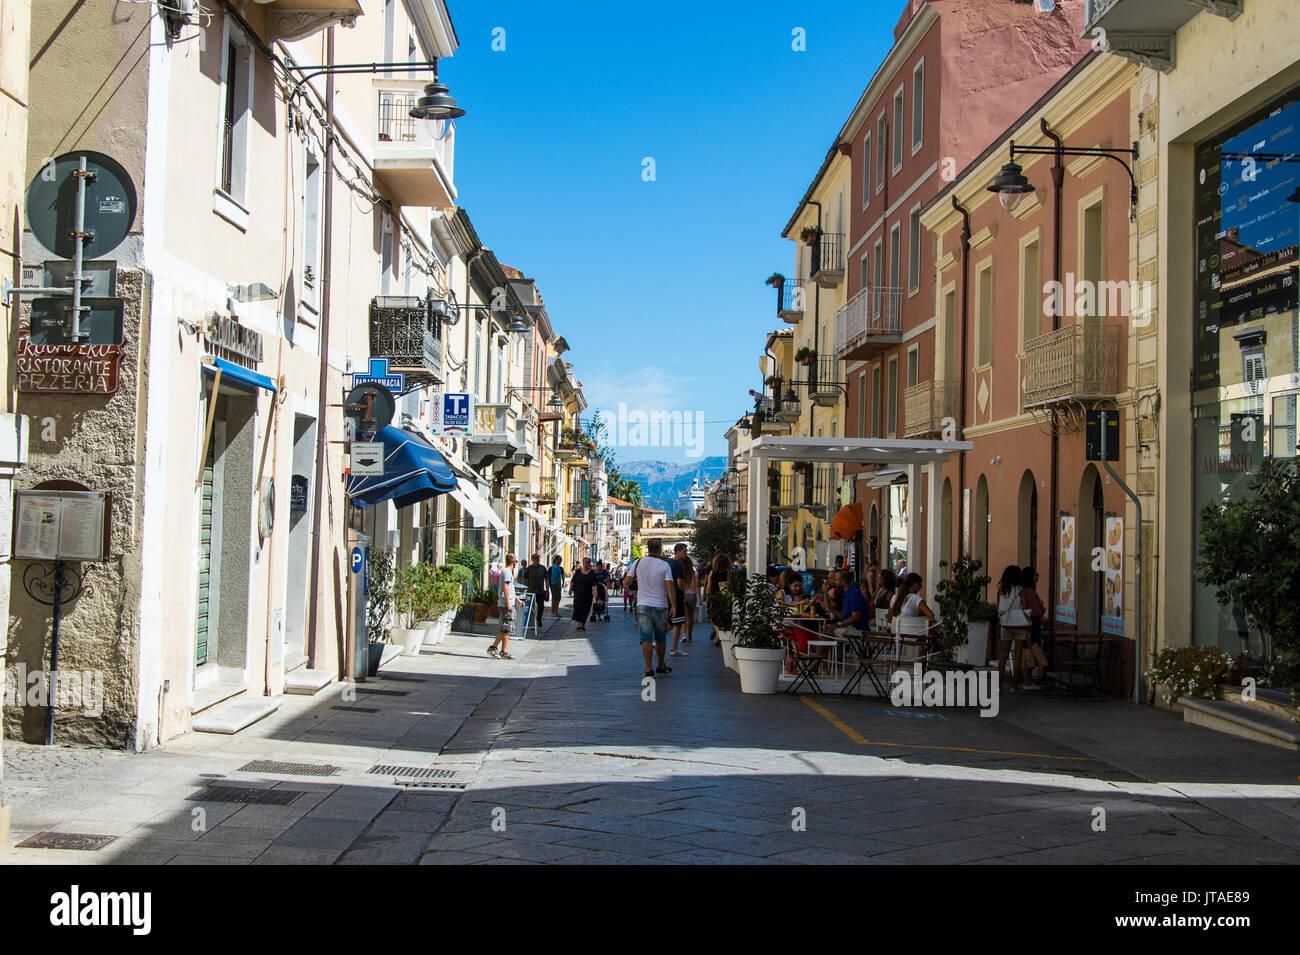 La zona peatonal de Olbia, Cerdeña, Italia, Mediterráneo, Europa Imagen De Stock